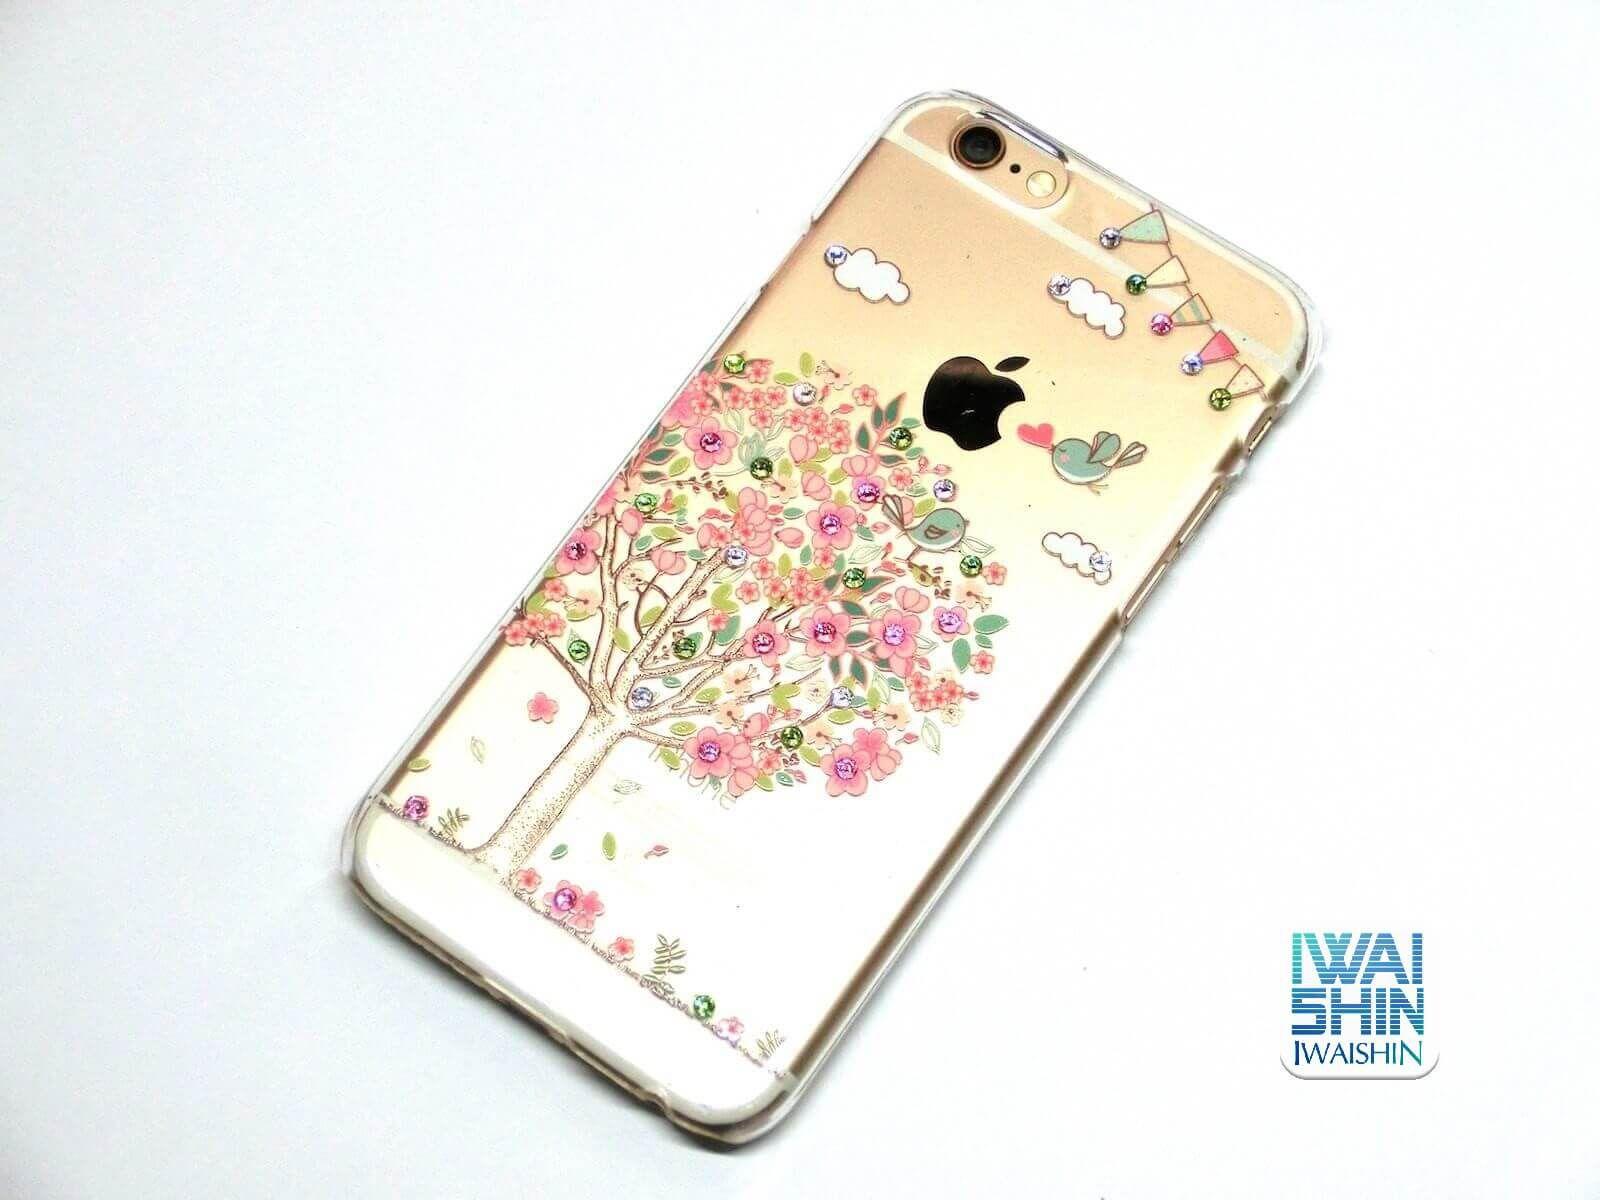 APBS 施華洛世奇 IPhone 6 保護殼5740